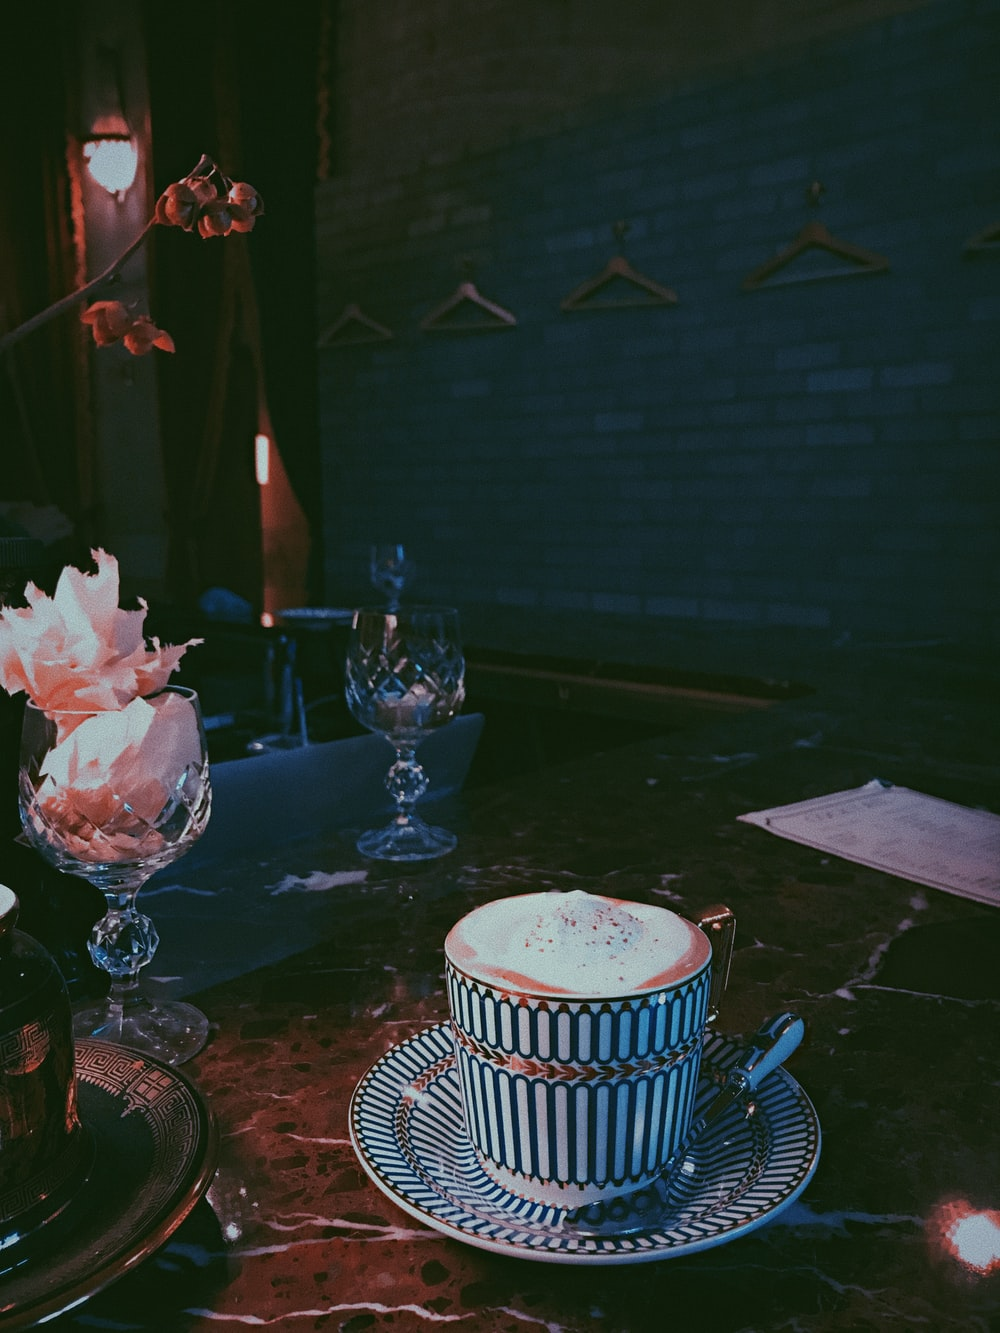 white and black ceramic mug on table